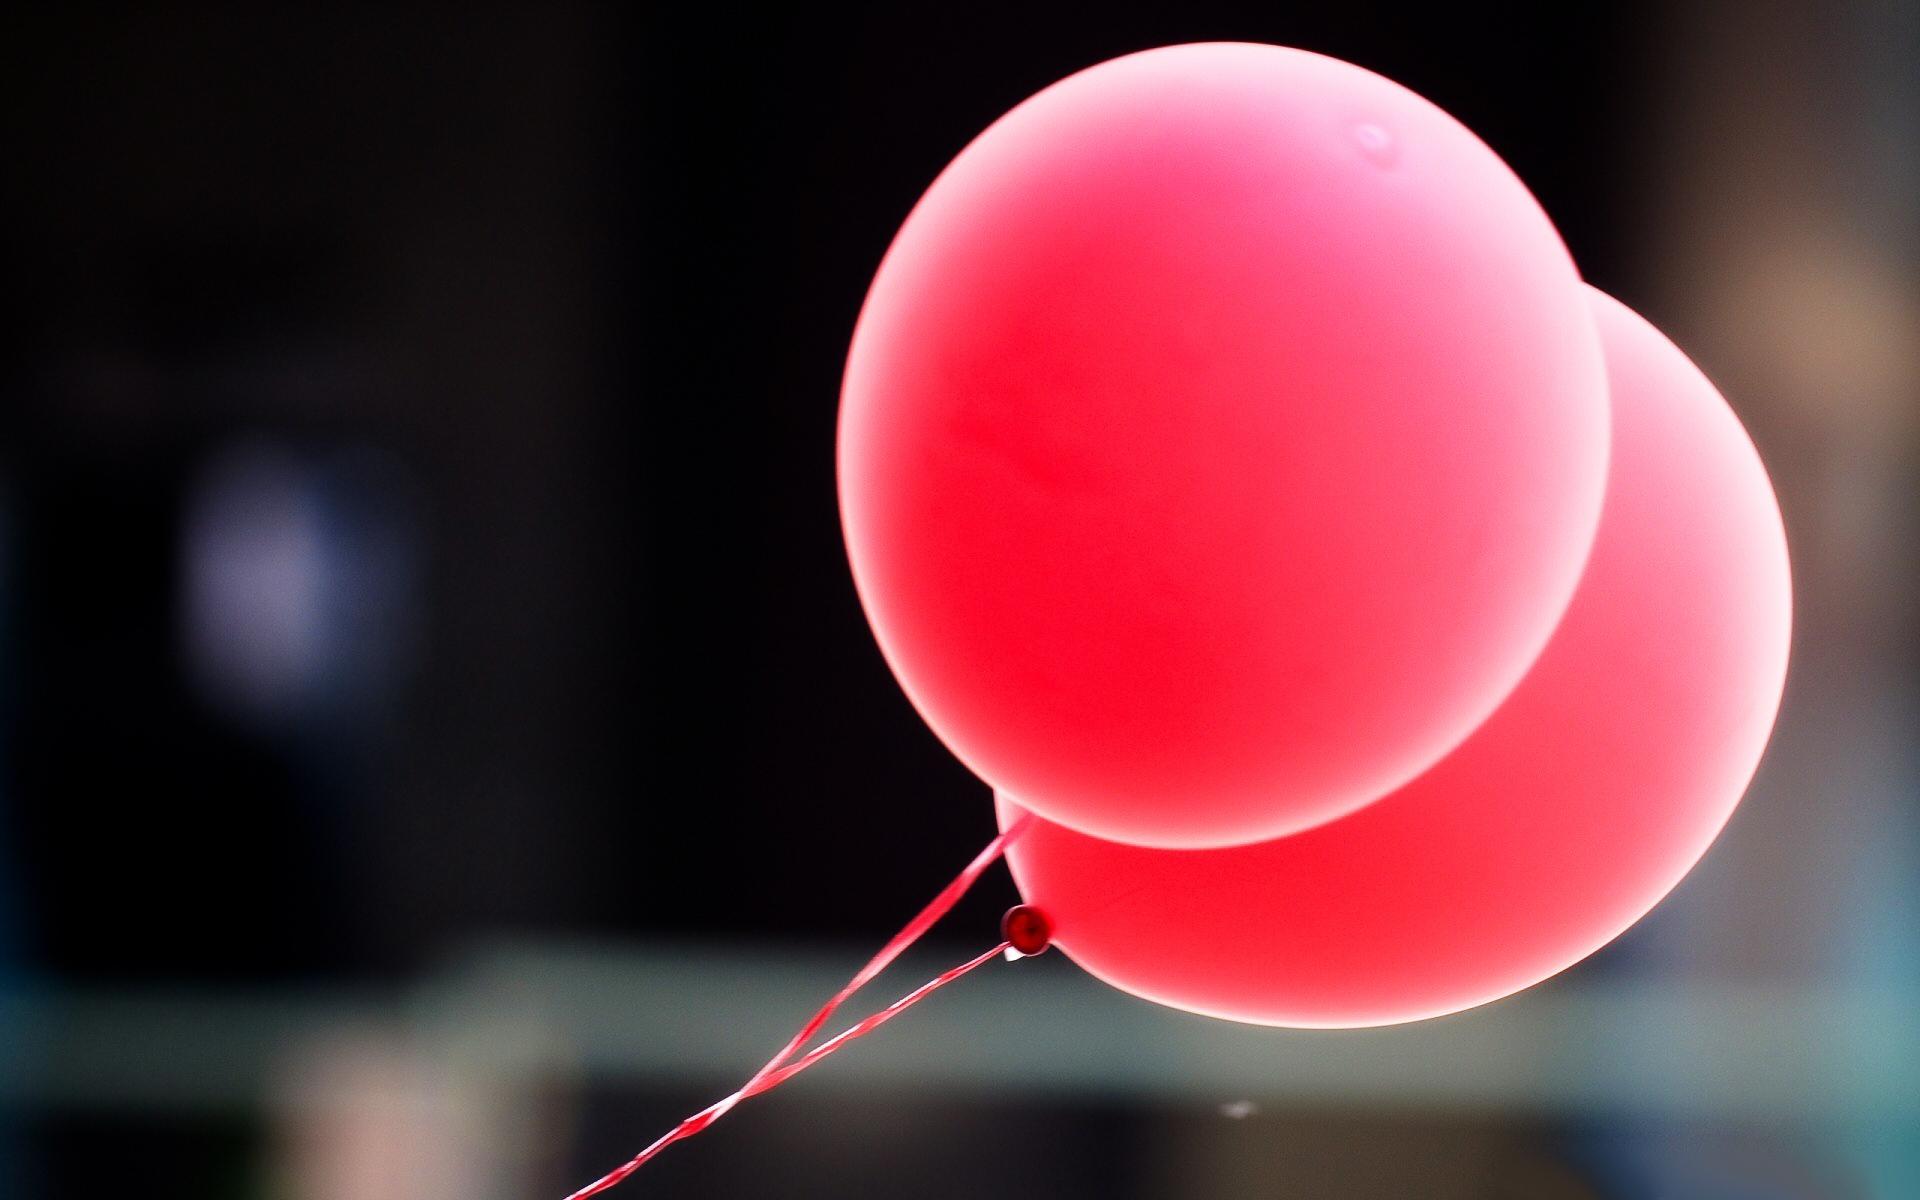 Pink Balloons Widescreen - Pink Balloons Widescreen